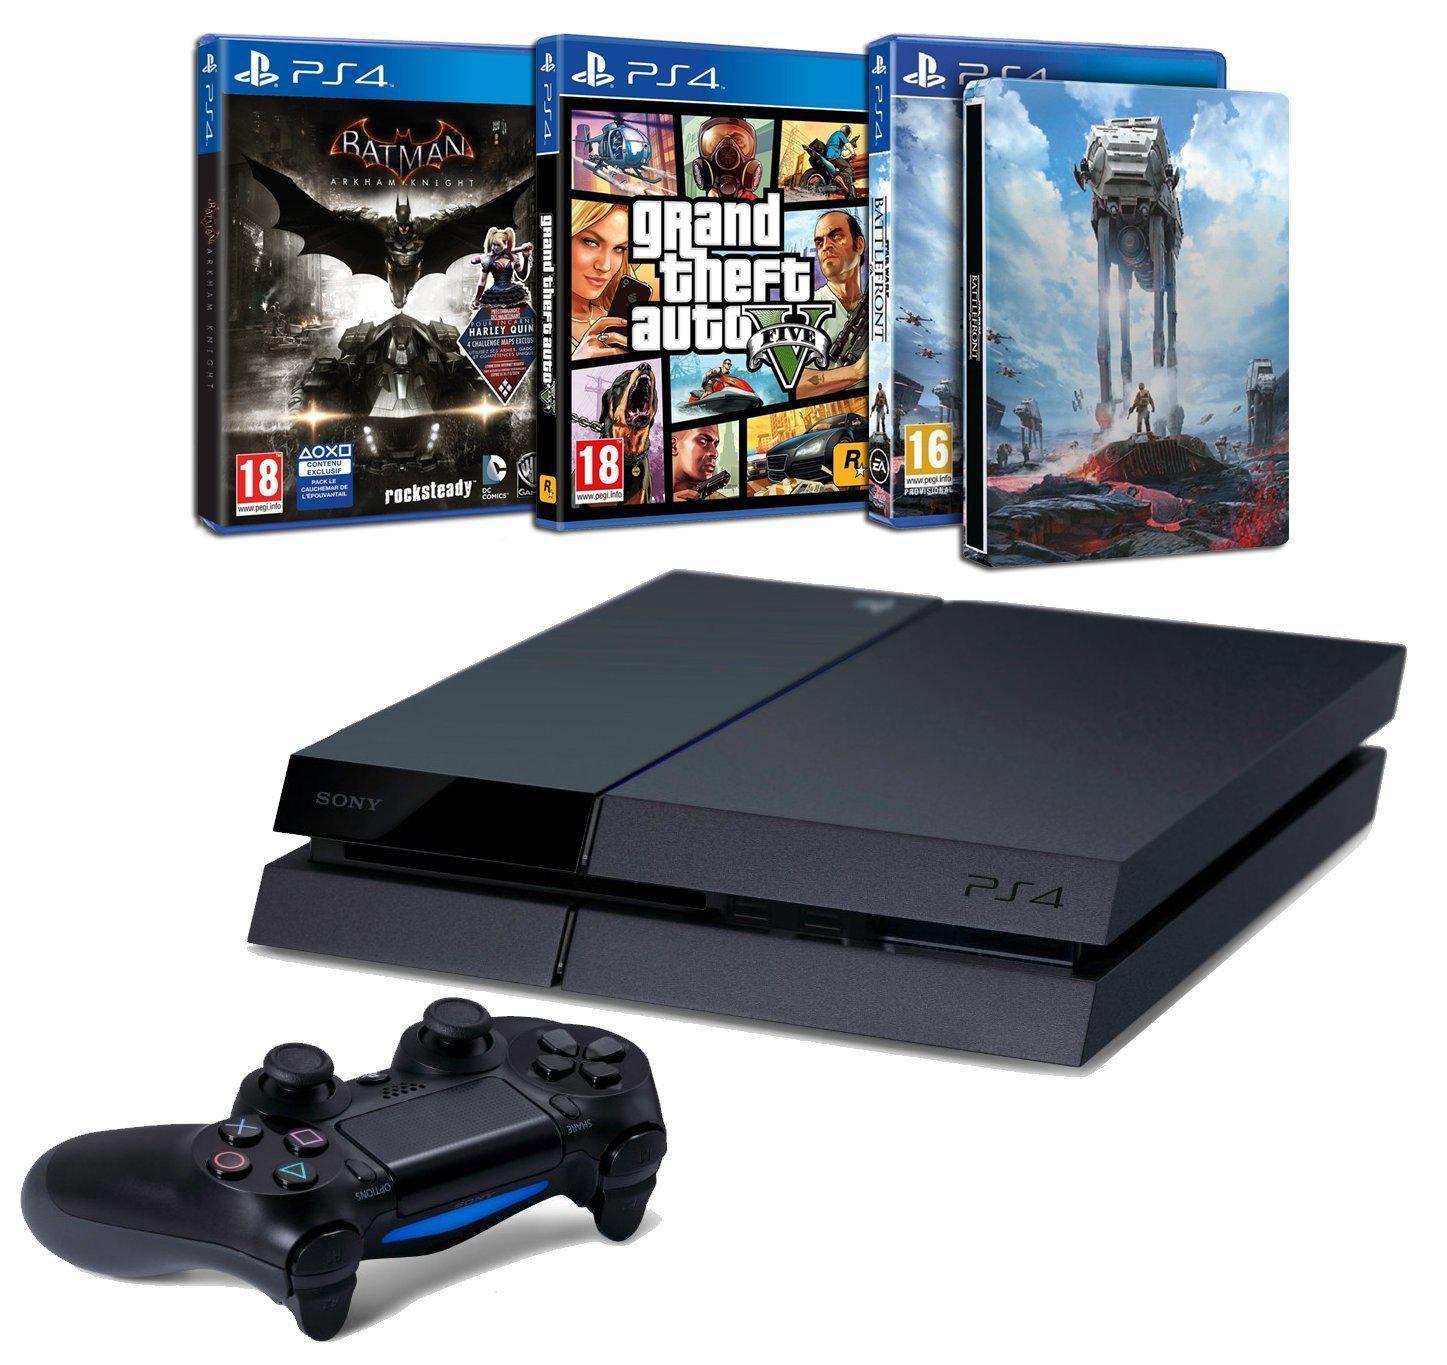 Pack console Sony PS4 500 Go + Batman Arkham Knight + Star Wars Battlefront + Steelbook + GTA V